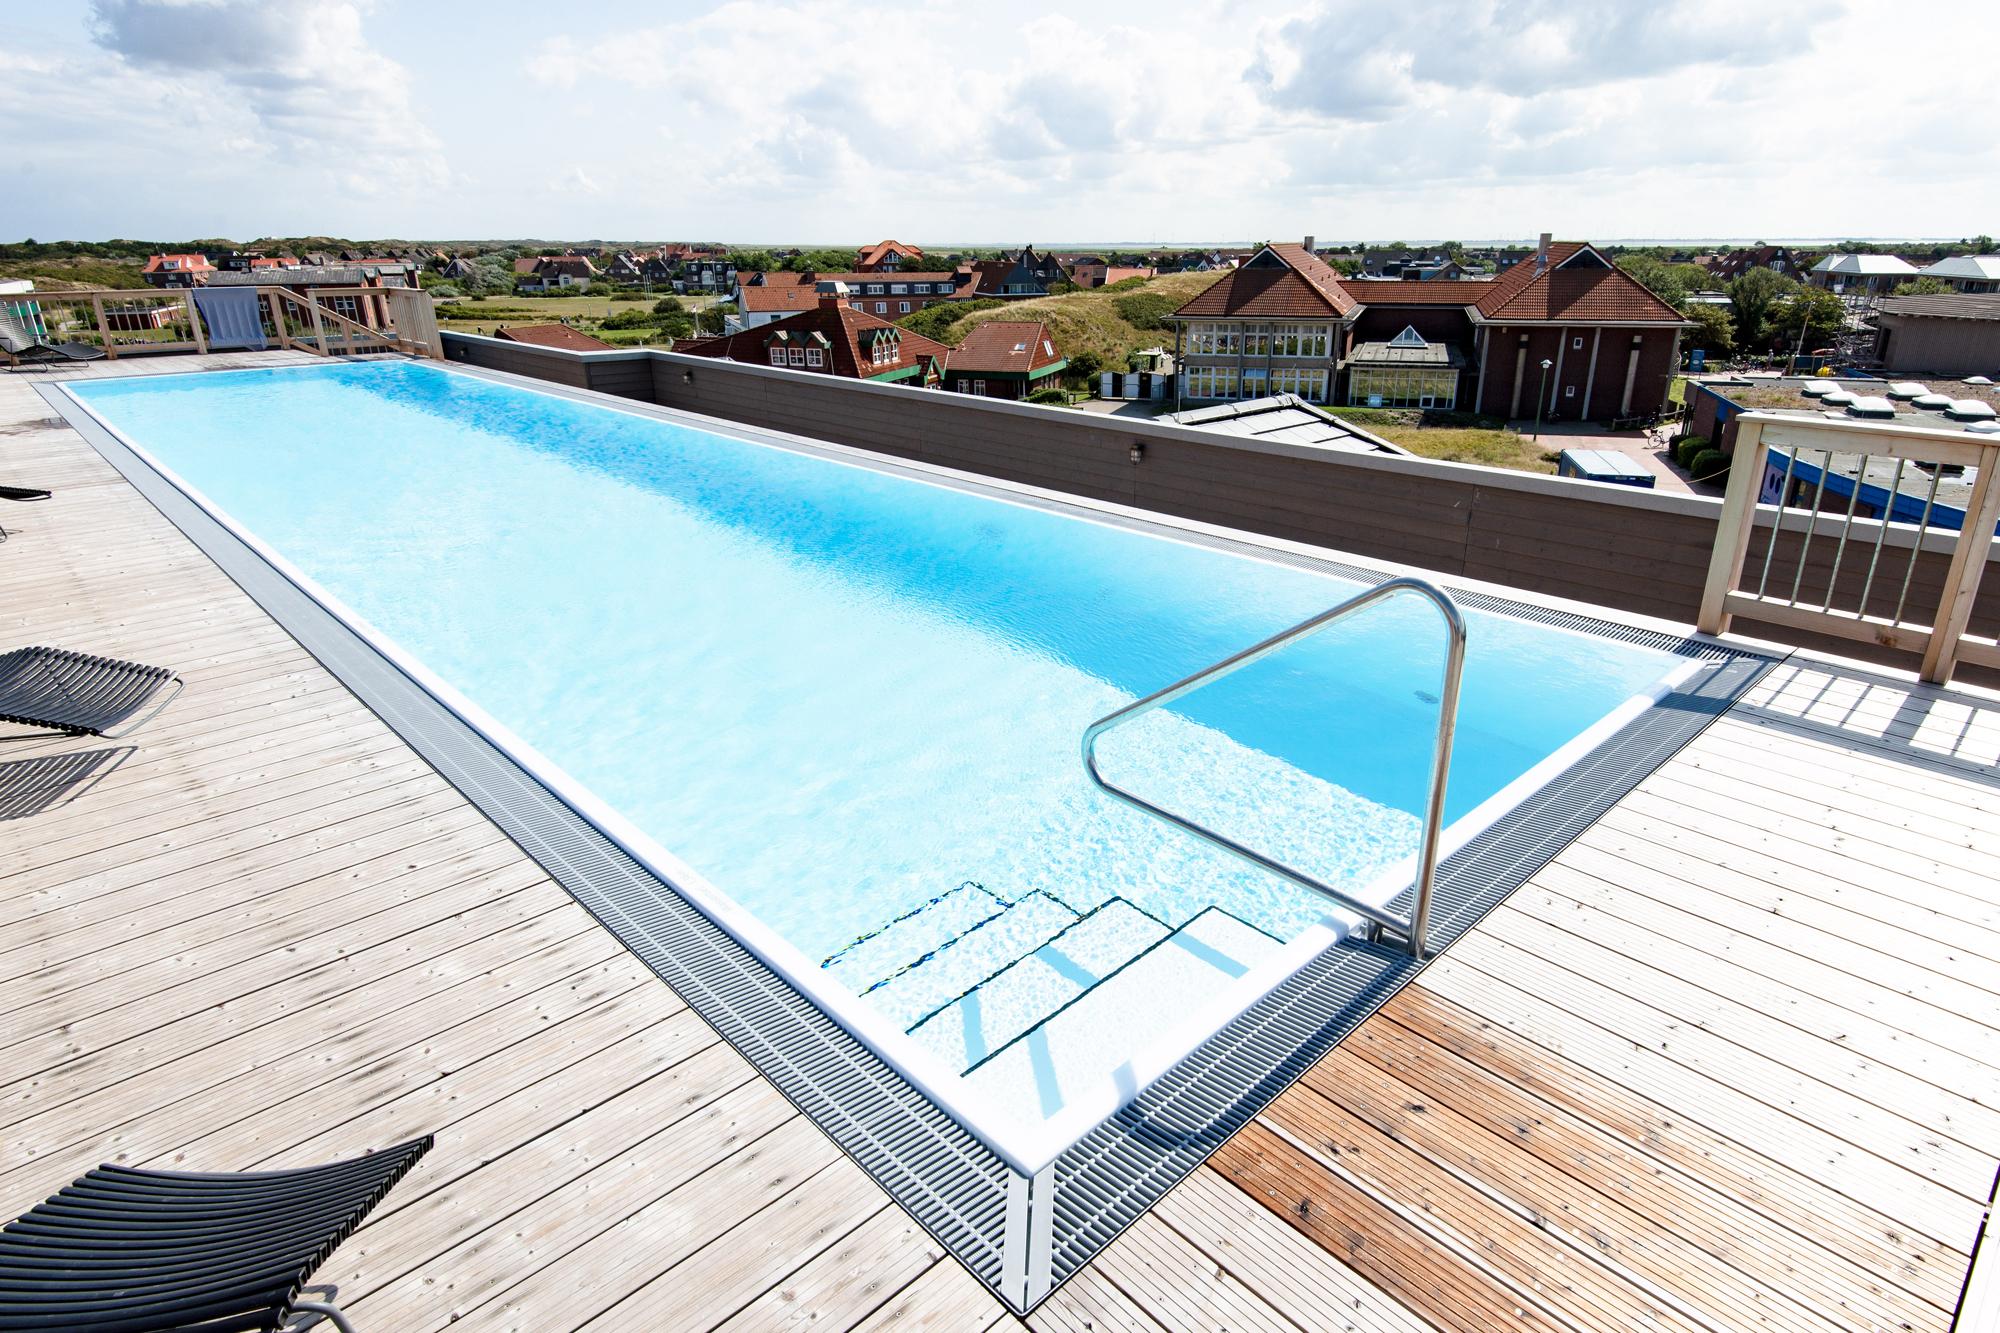 Rooftop-Pool zudem freistehend